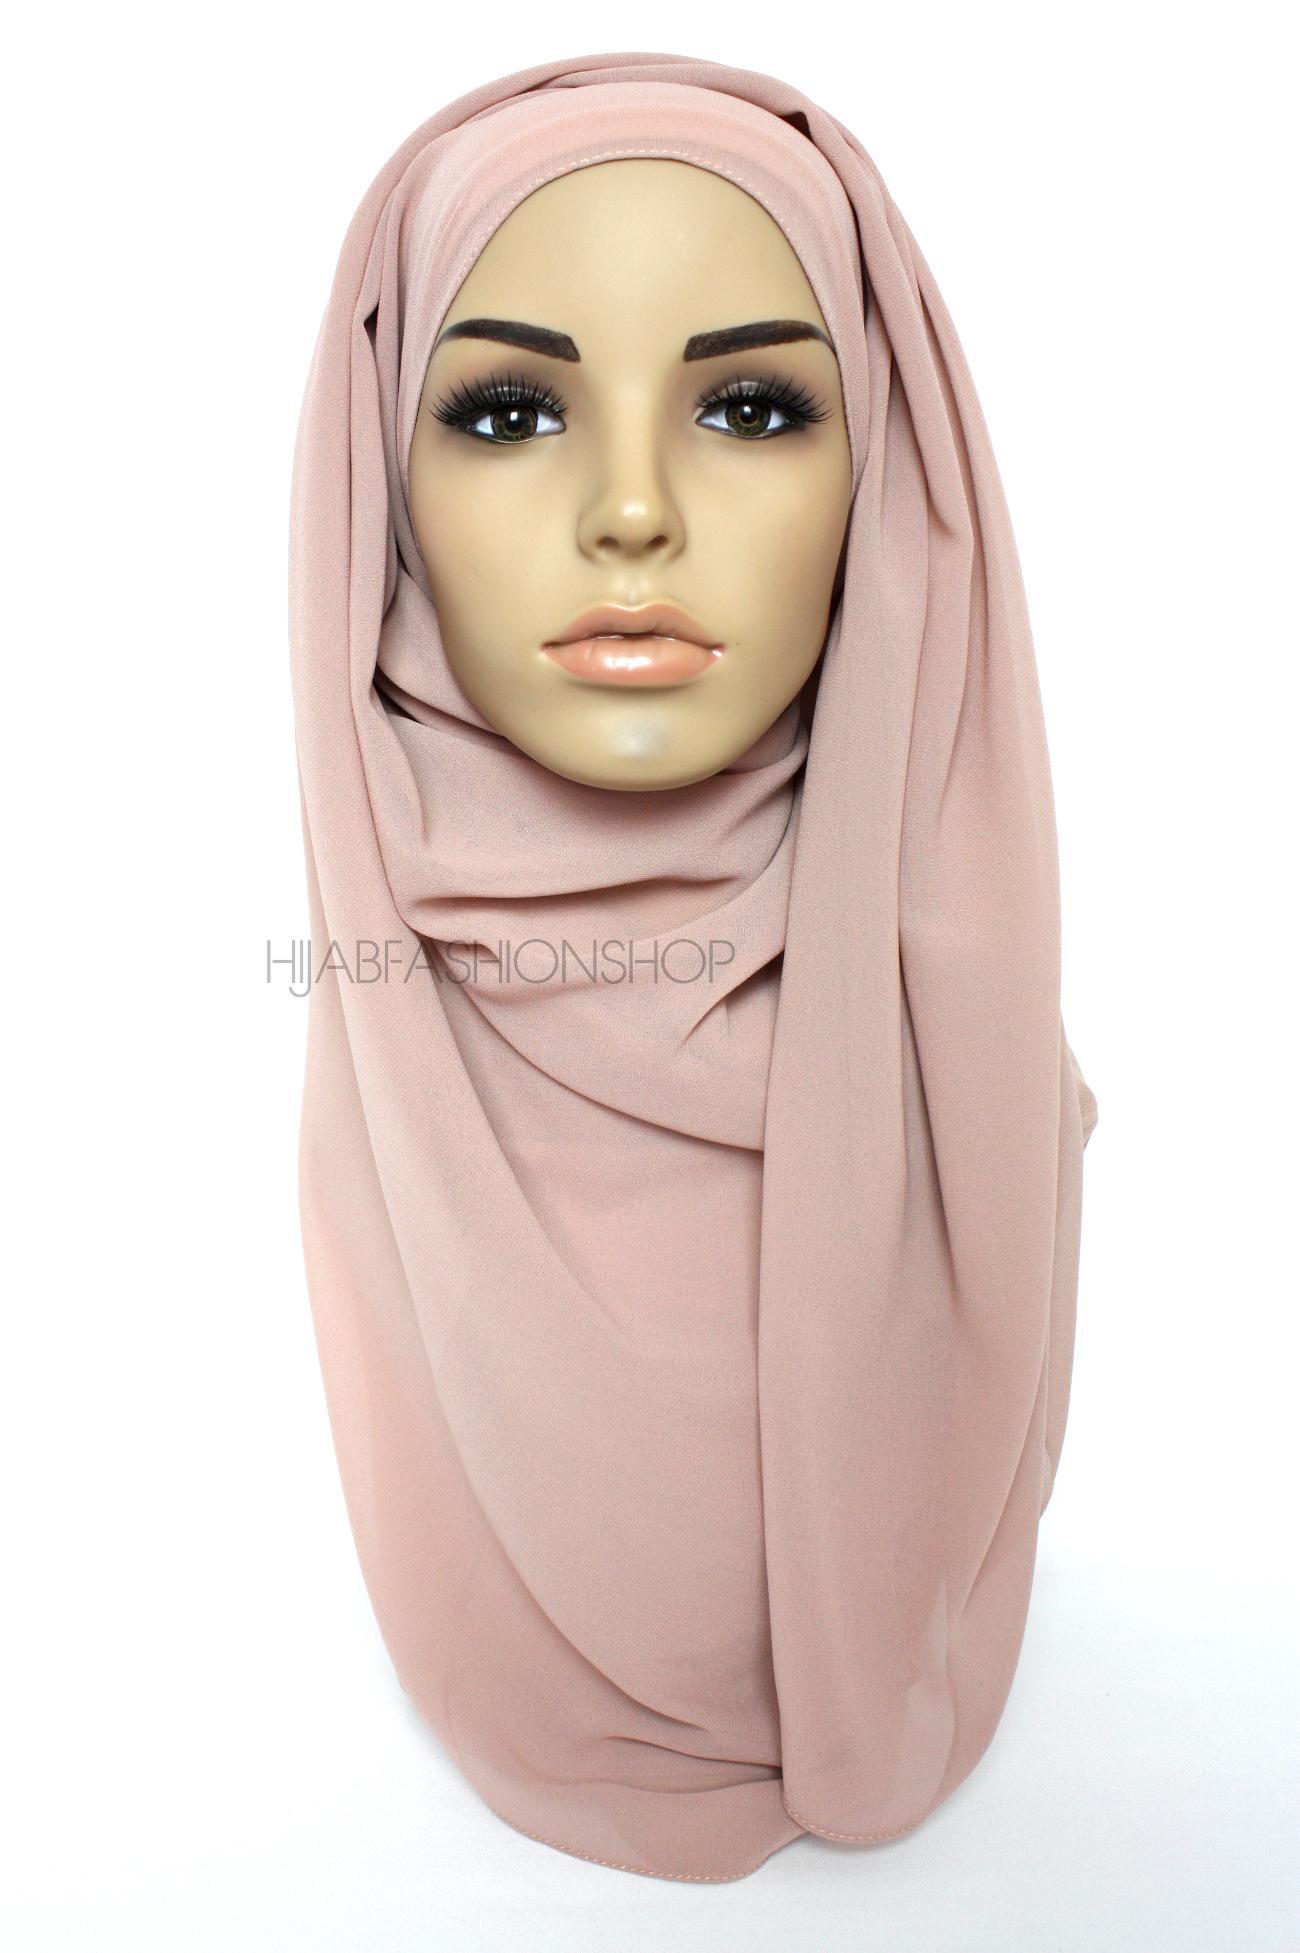 Hijab Fashion Shop - UK Hijab Online Store